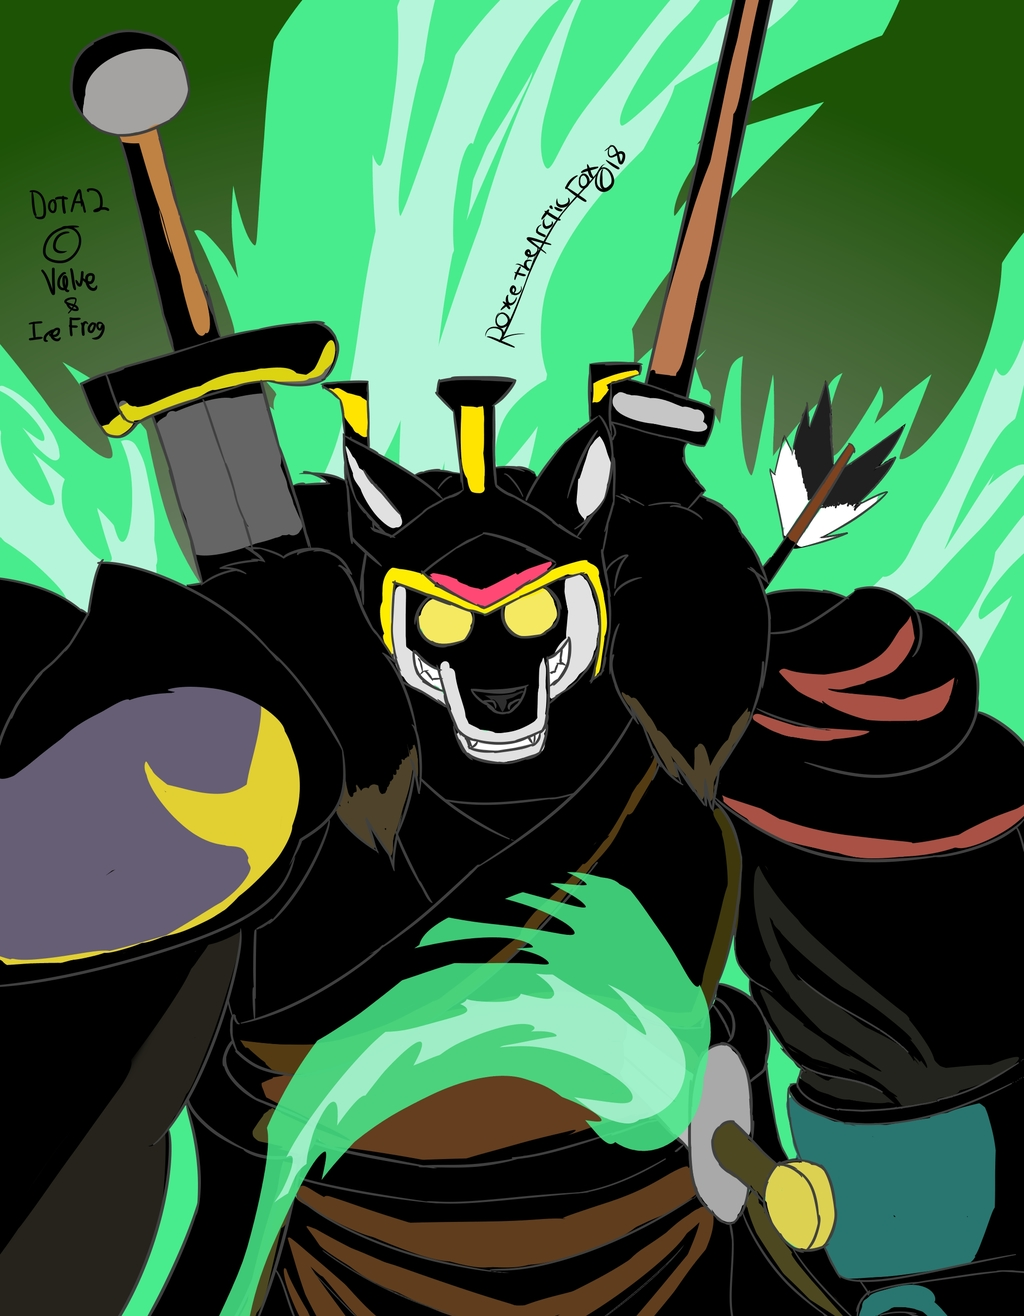 (DOTA2 Fan) Wraith Resurrection with a side of vengeance.